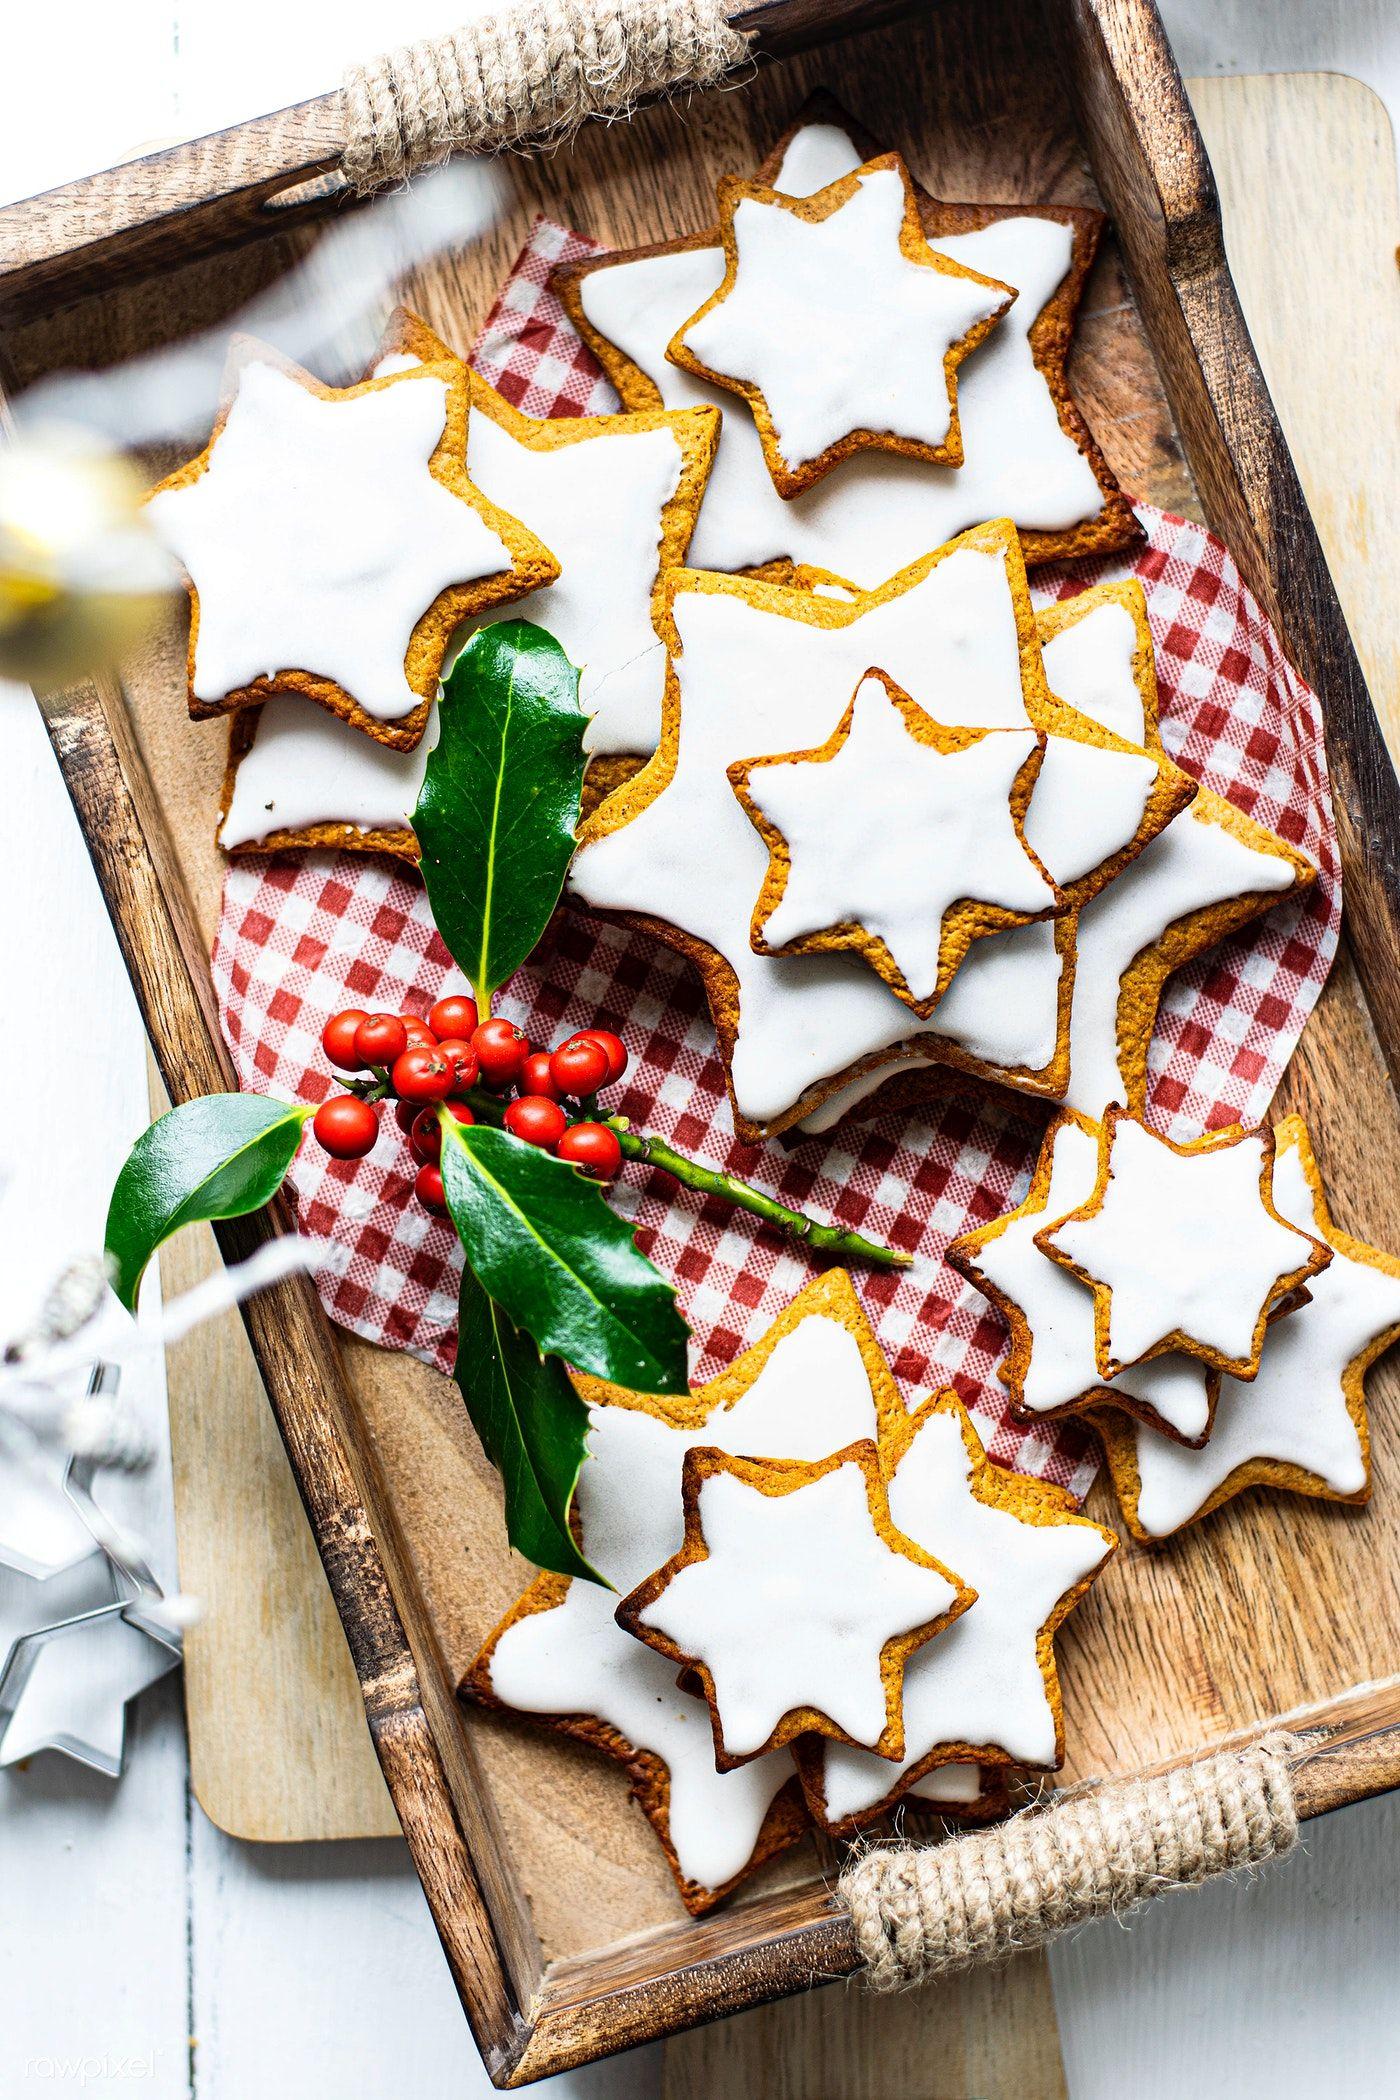 Download premium photo of Star gingerbread cookie recipe